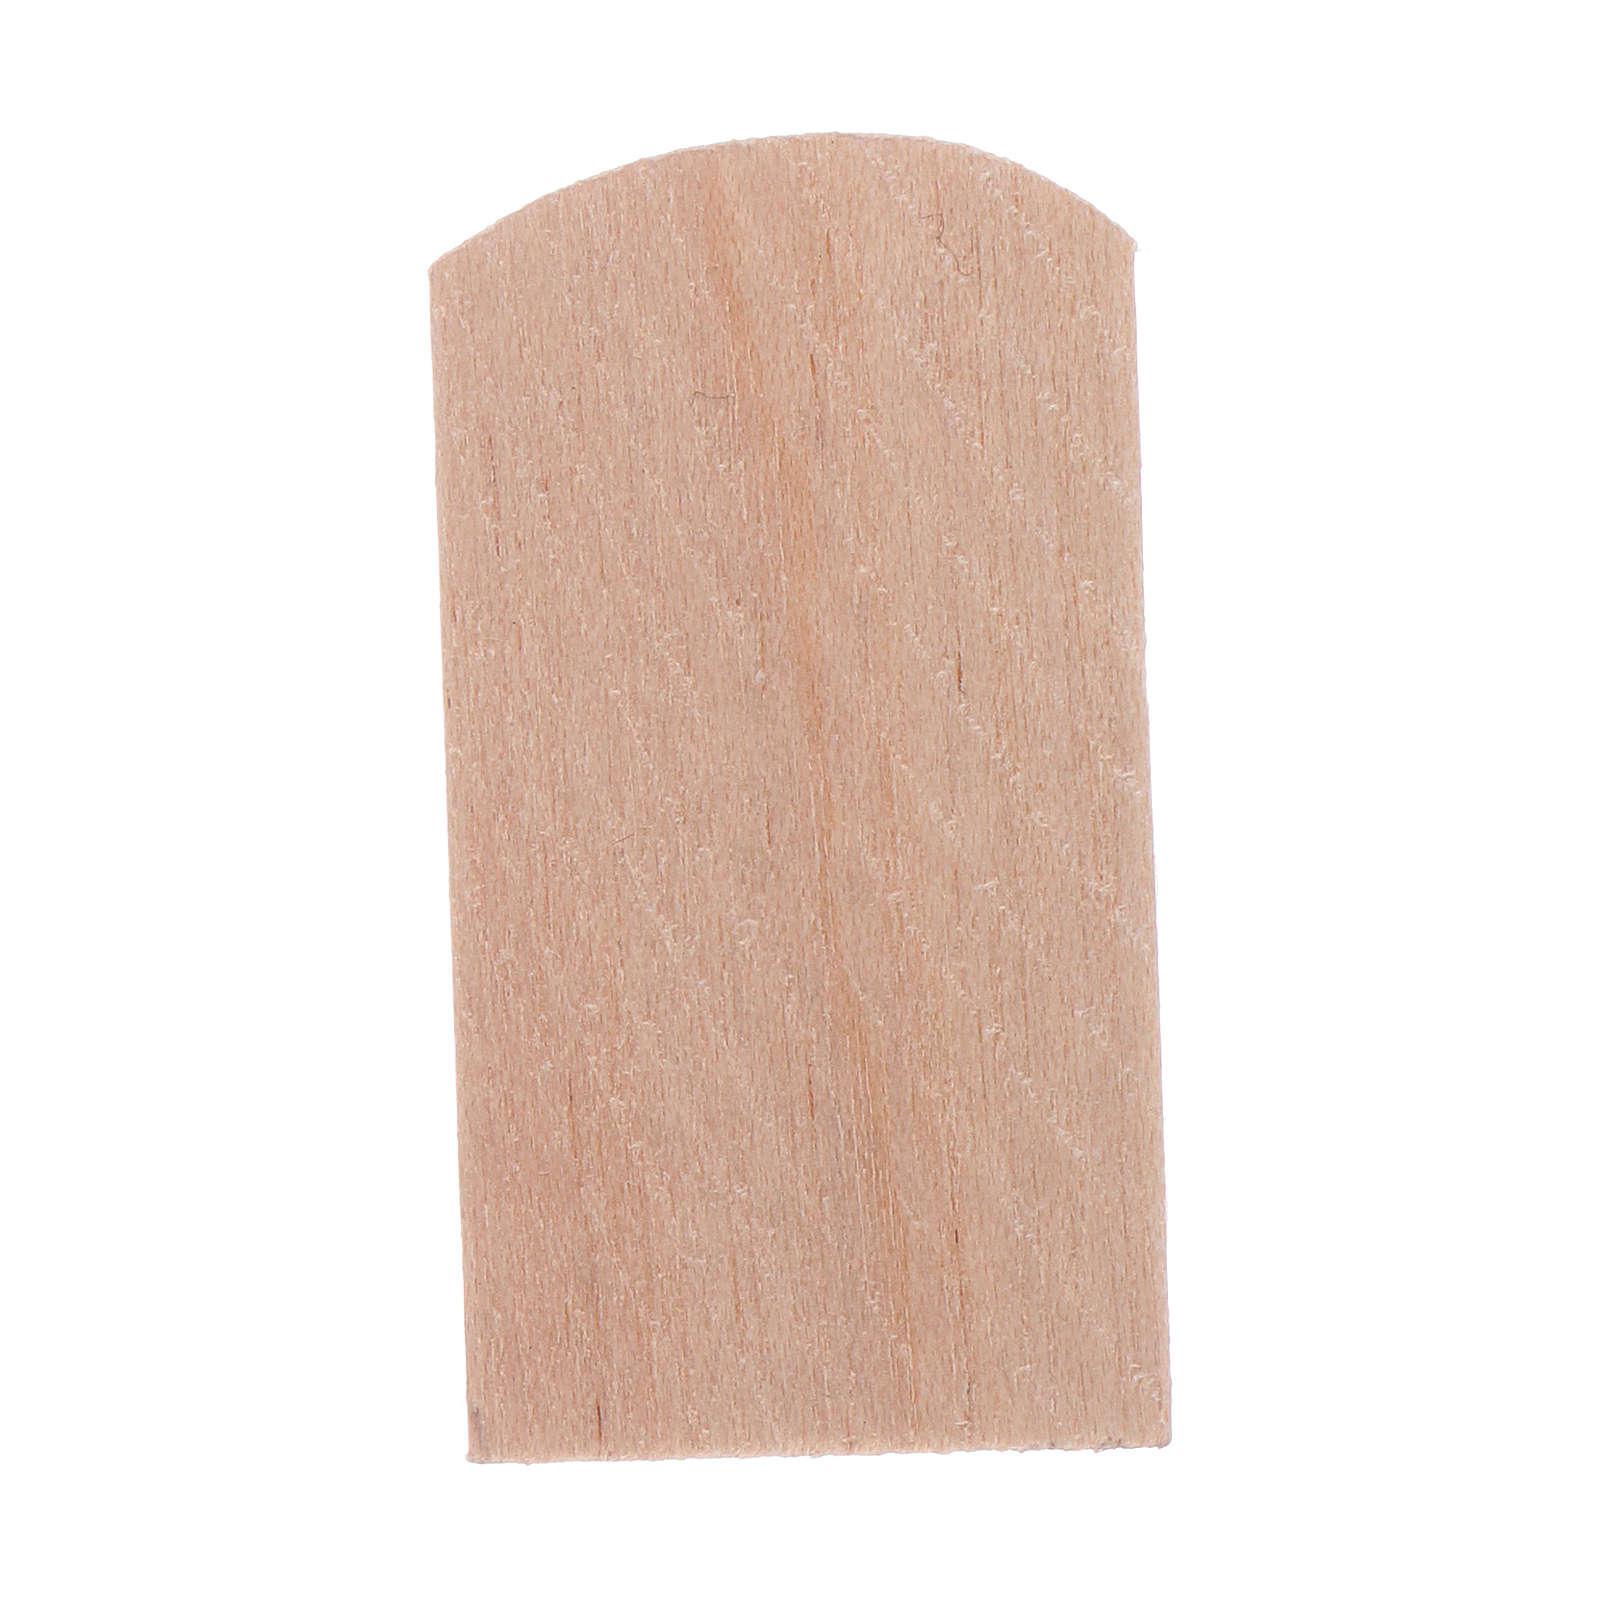 Scandole legno 100 pz presepe 1,5x3 cm 4